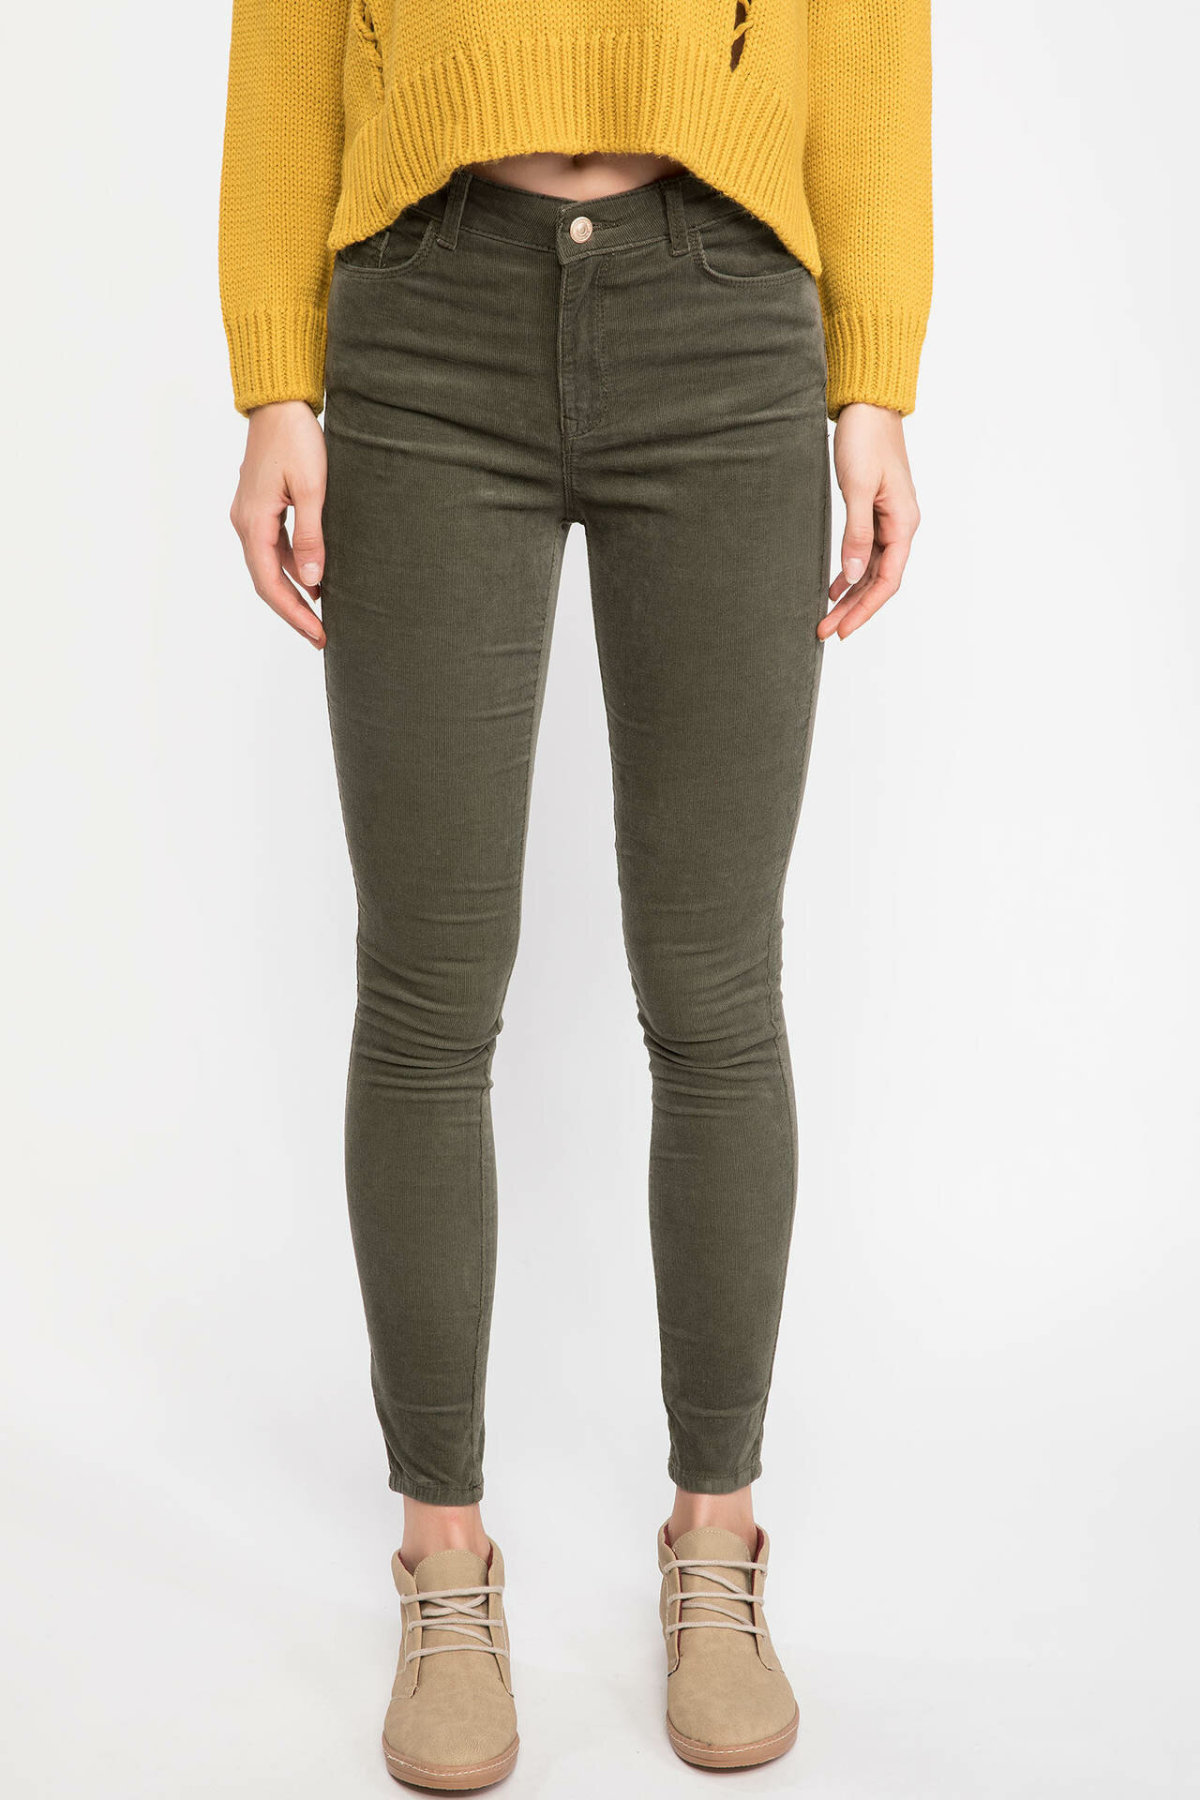 DeFacto Women Fashion Solid Jean Trousers Female High Waist Elastic Denim Female Slim Pencil Pants Ladies-J1542AZ18WN